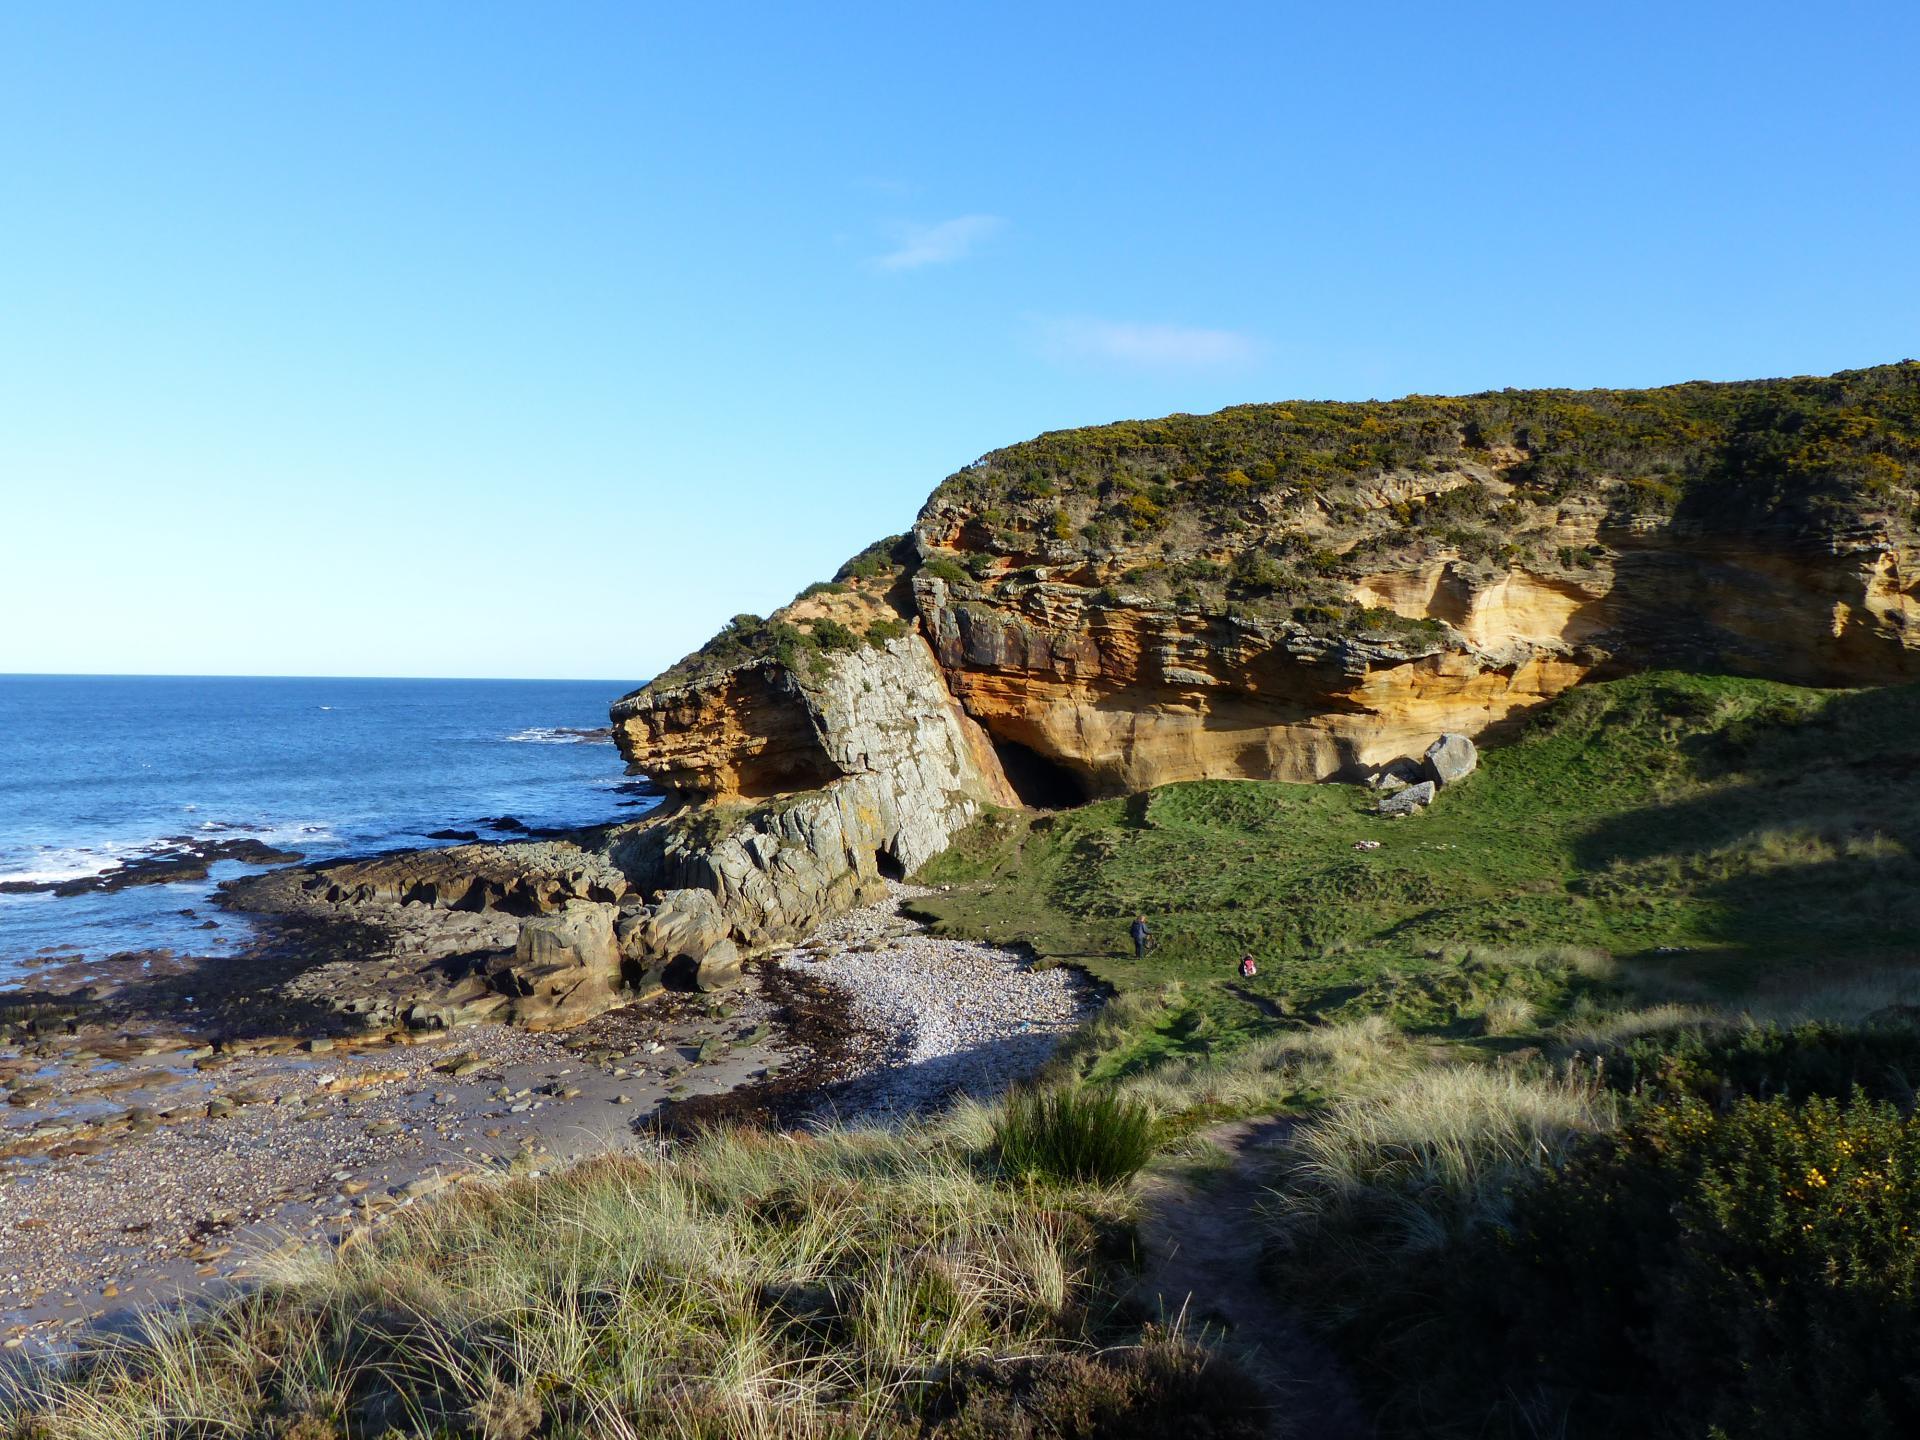 Speise Wanderreise - Moray Küste